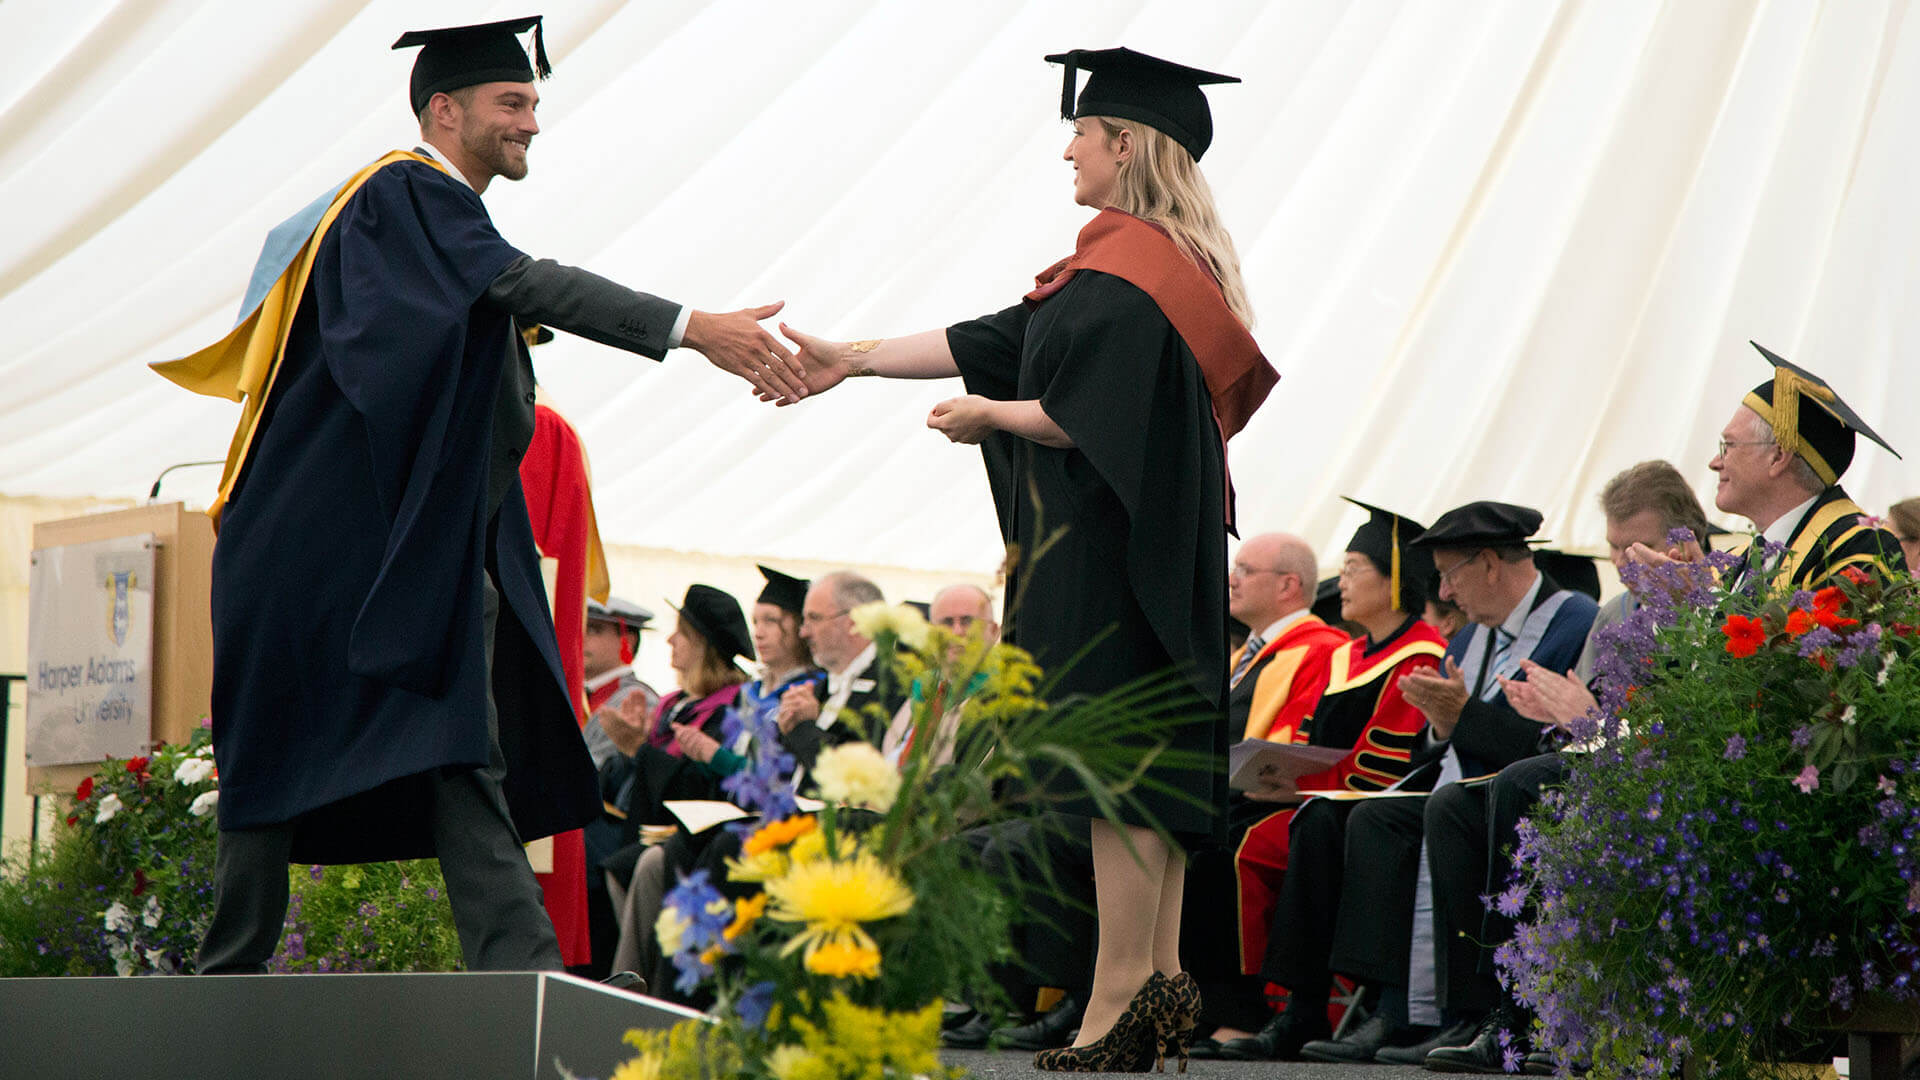 events graduation information harper adams university